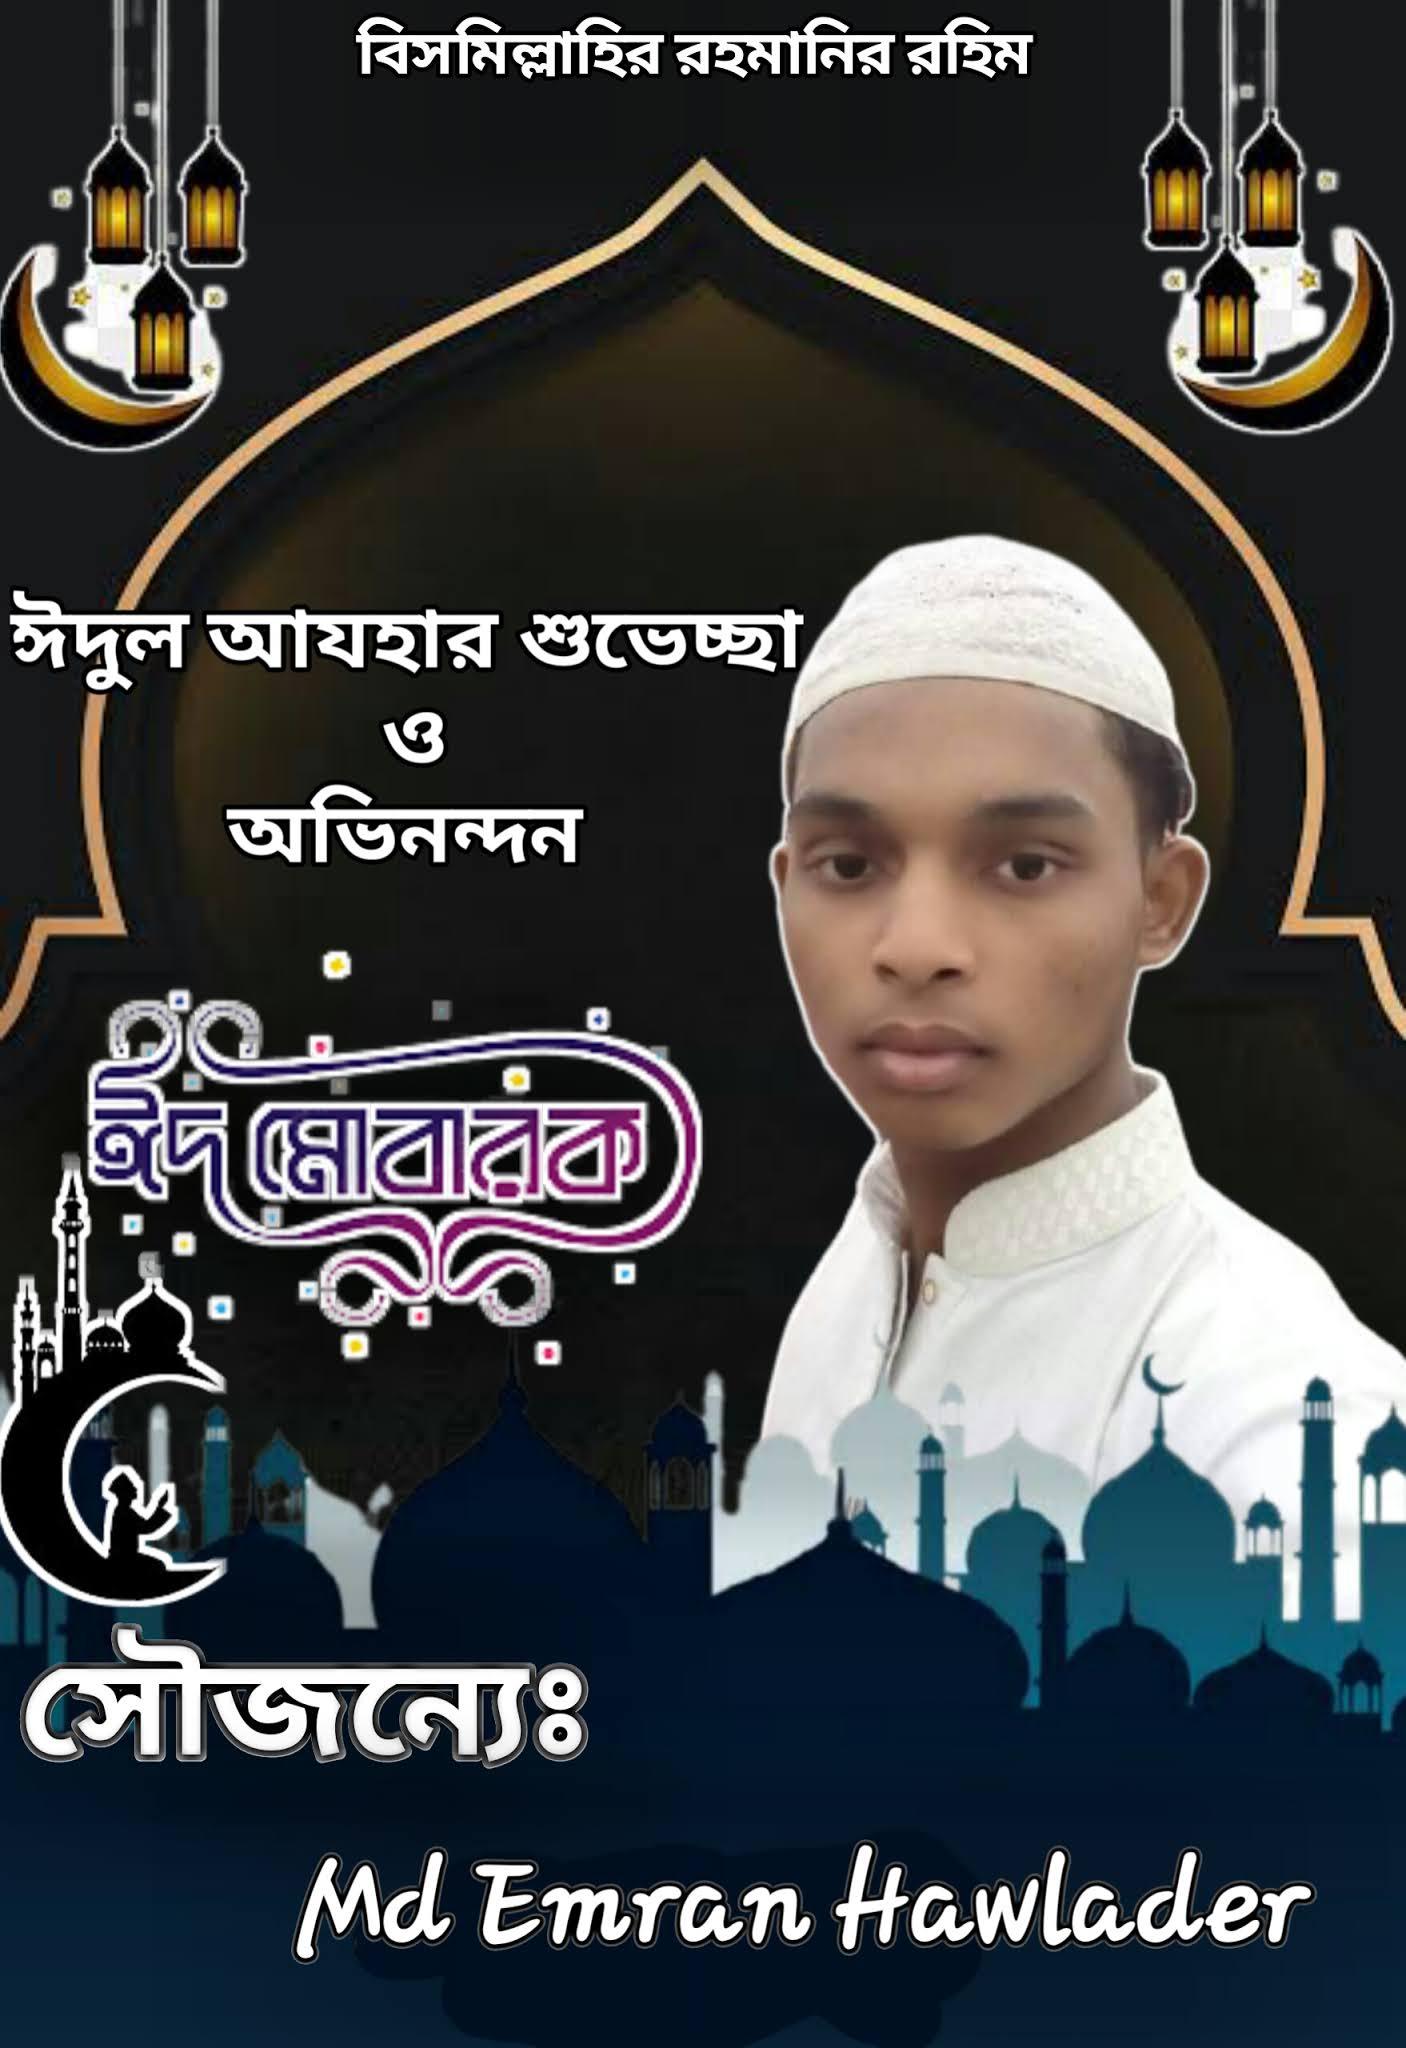 Eid ul Adha poster design ( 4 )  ঈদুল আযহার পোস্টার ডিজাইন ( ৪ )